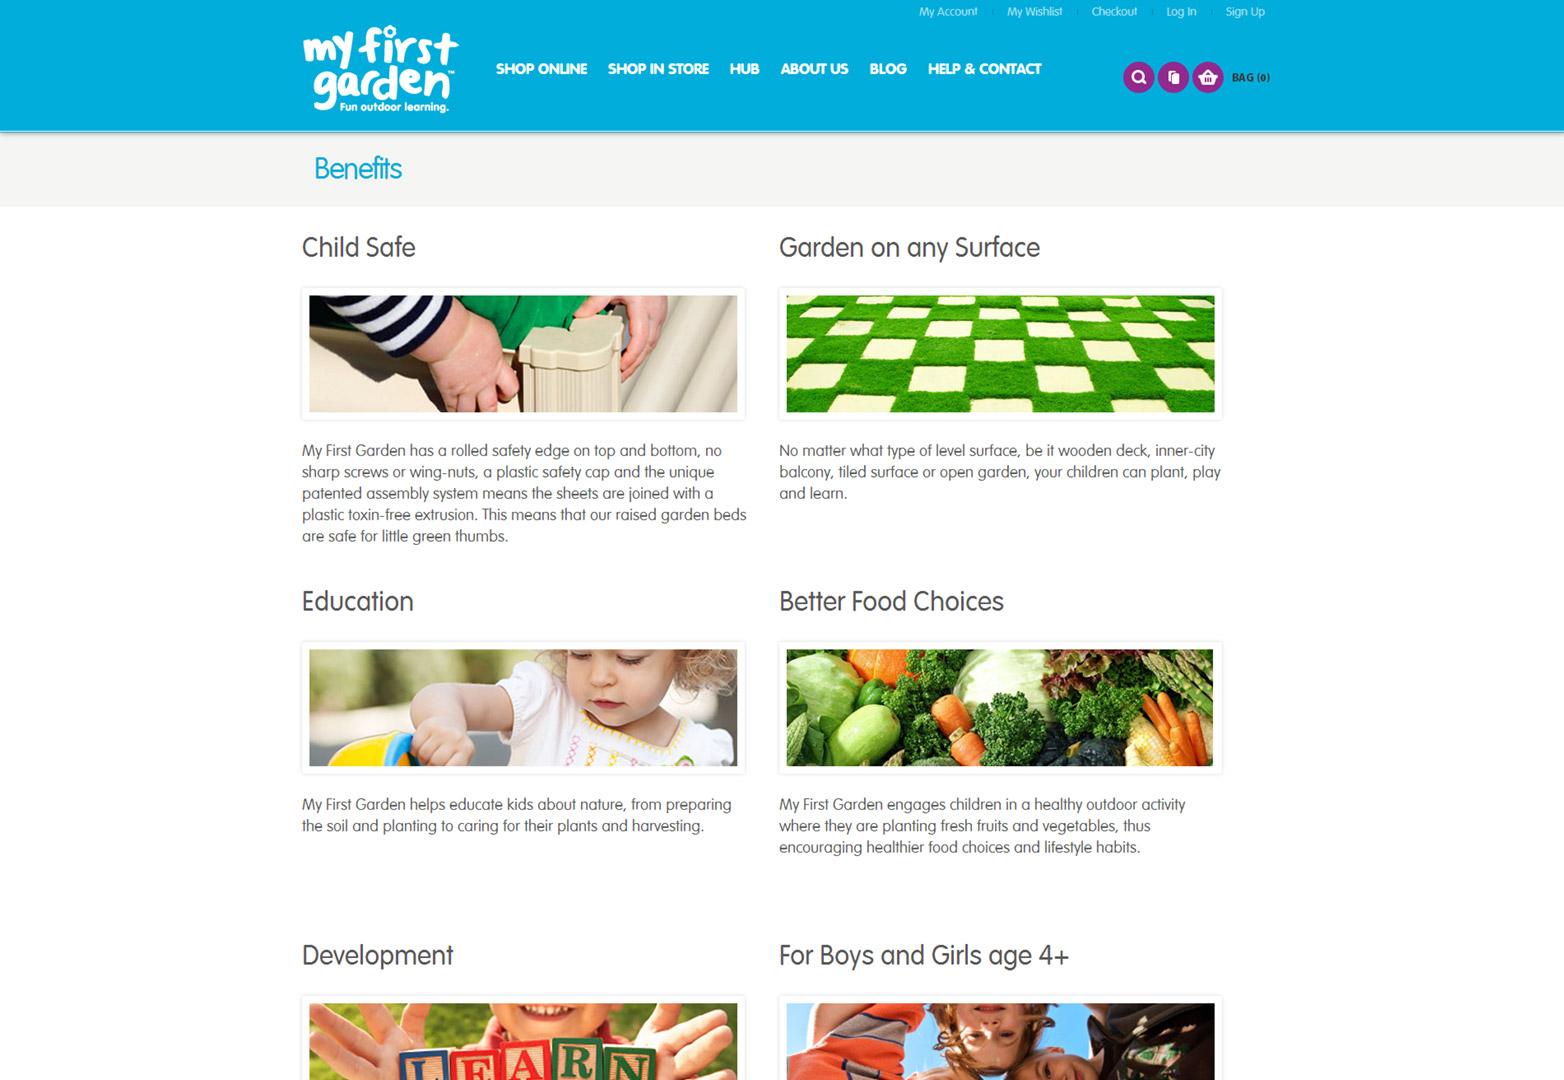 My First Garden benefits page